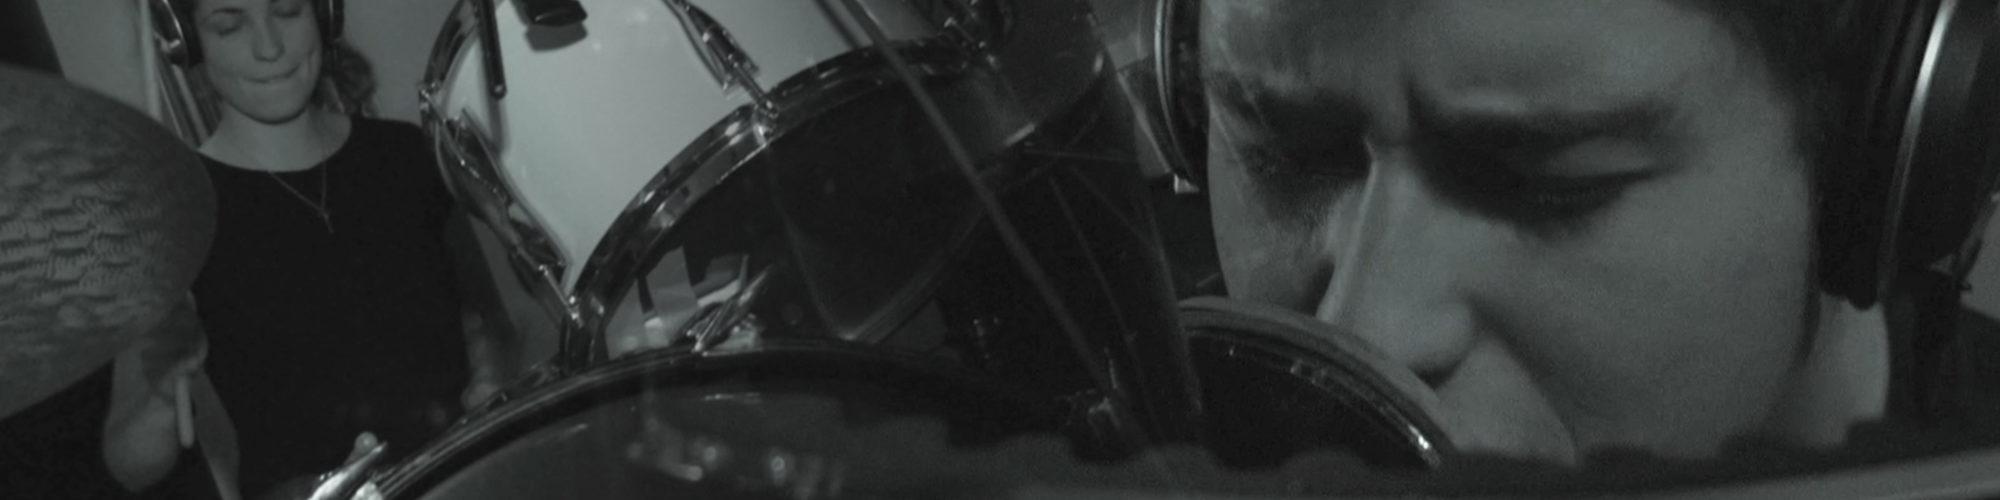 WEB Sup videoclip